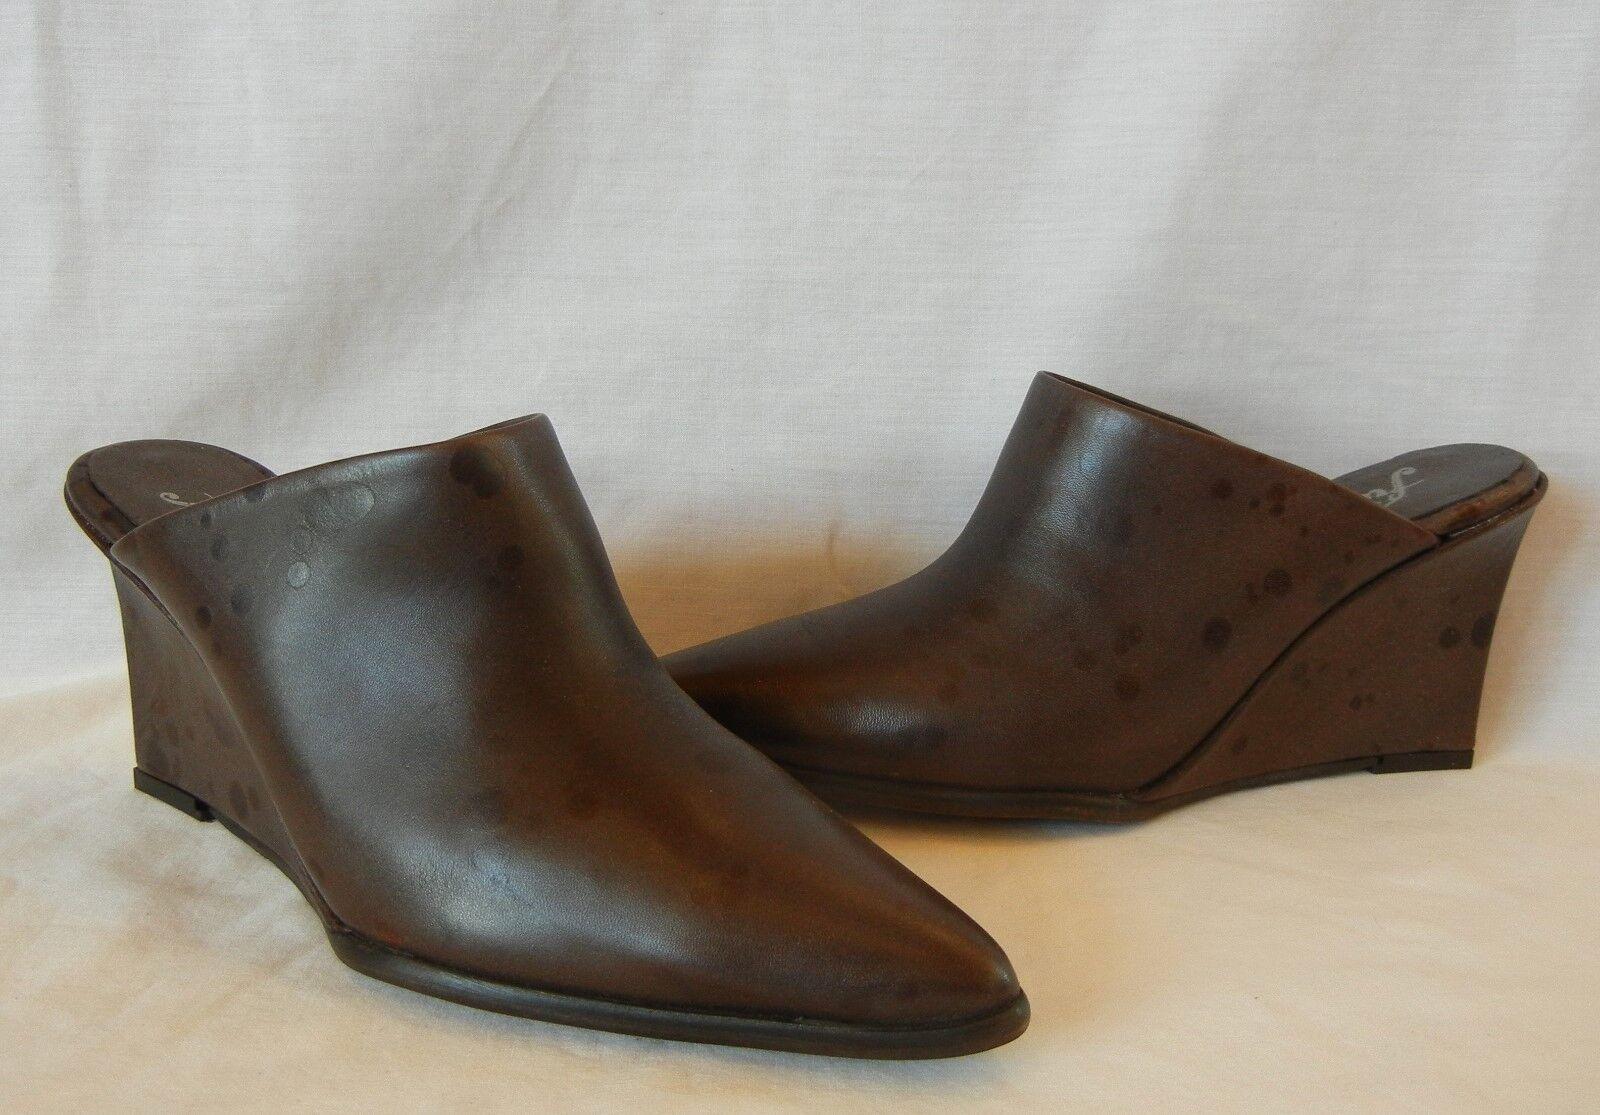 Free People Damenschuhe Galactica Leder Wedge Heel Heel Heel Mule Slides Retail 178 Größe 10 2e3ccd